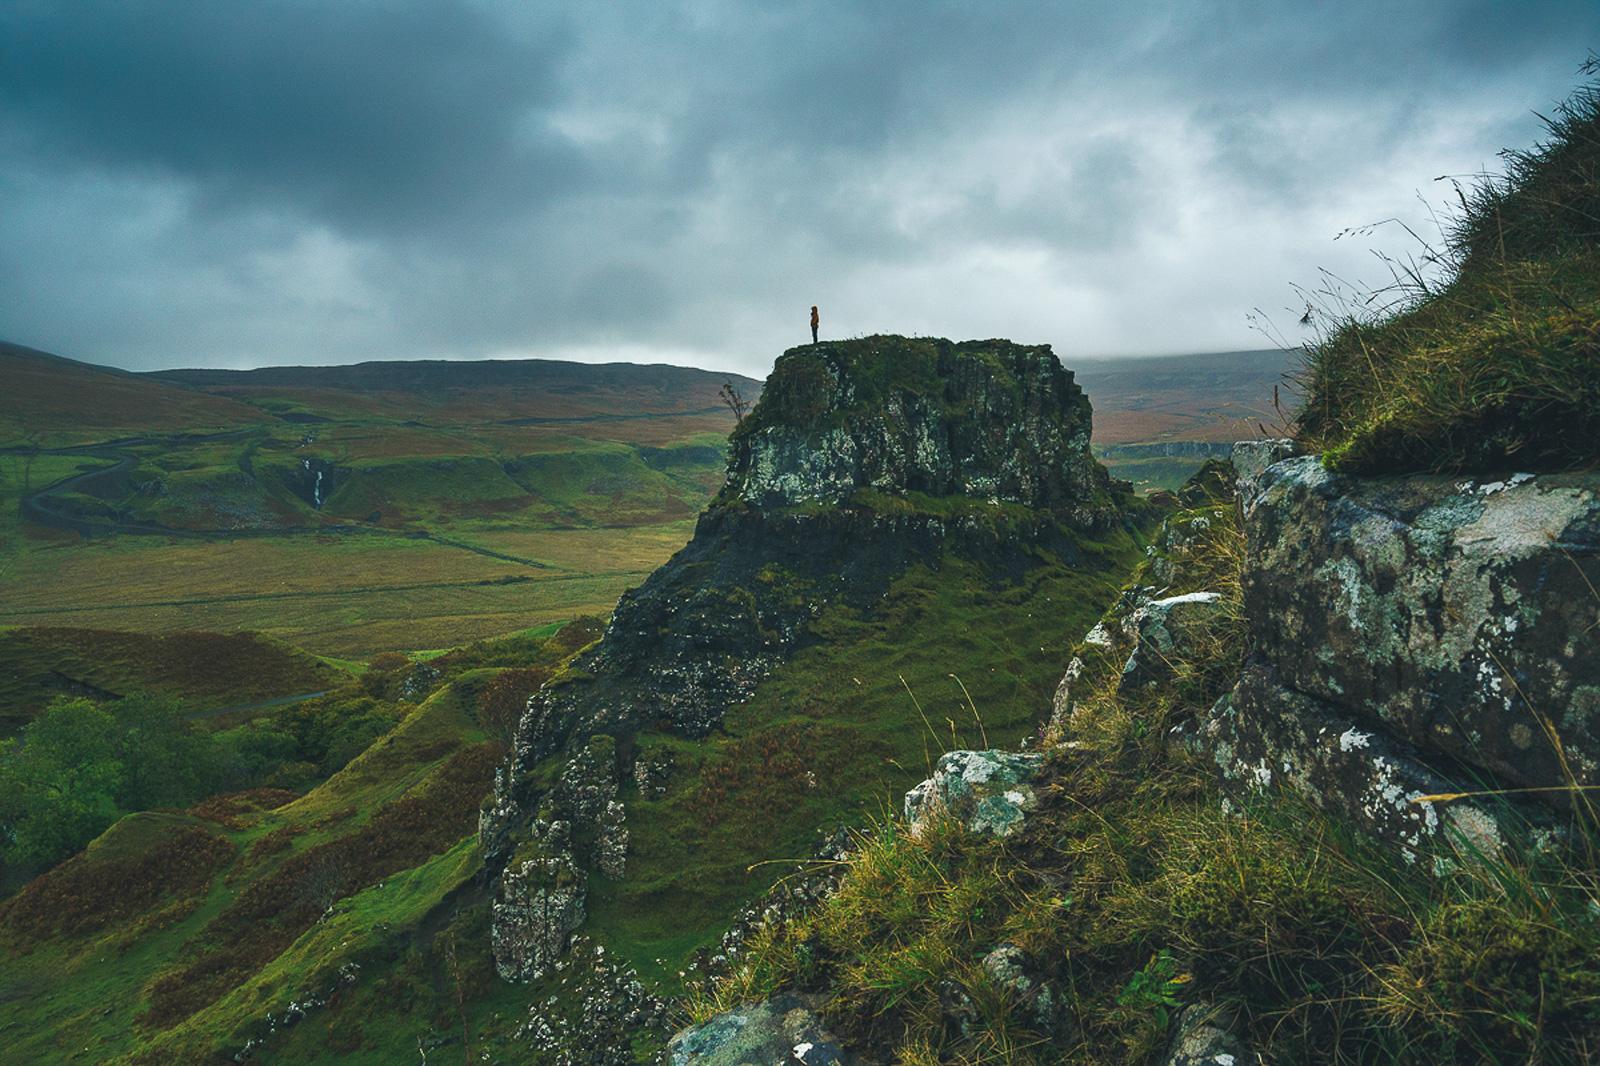 Reisebericht Fotoreise Isle of Skye, Schottland mit Lukas Voegelin